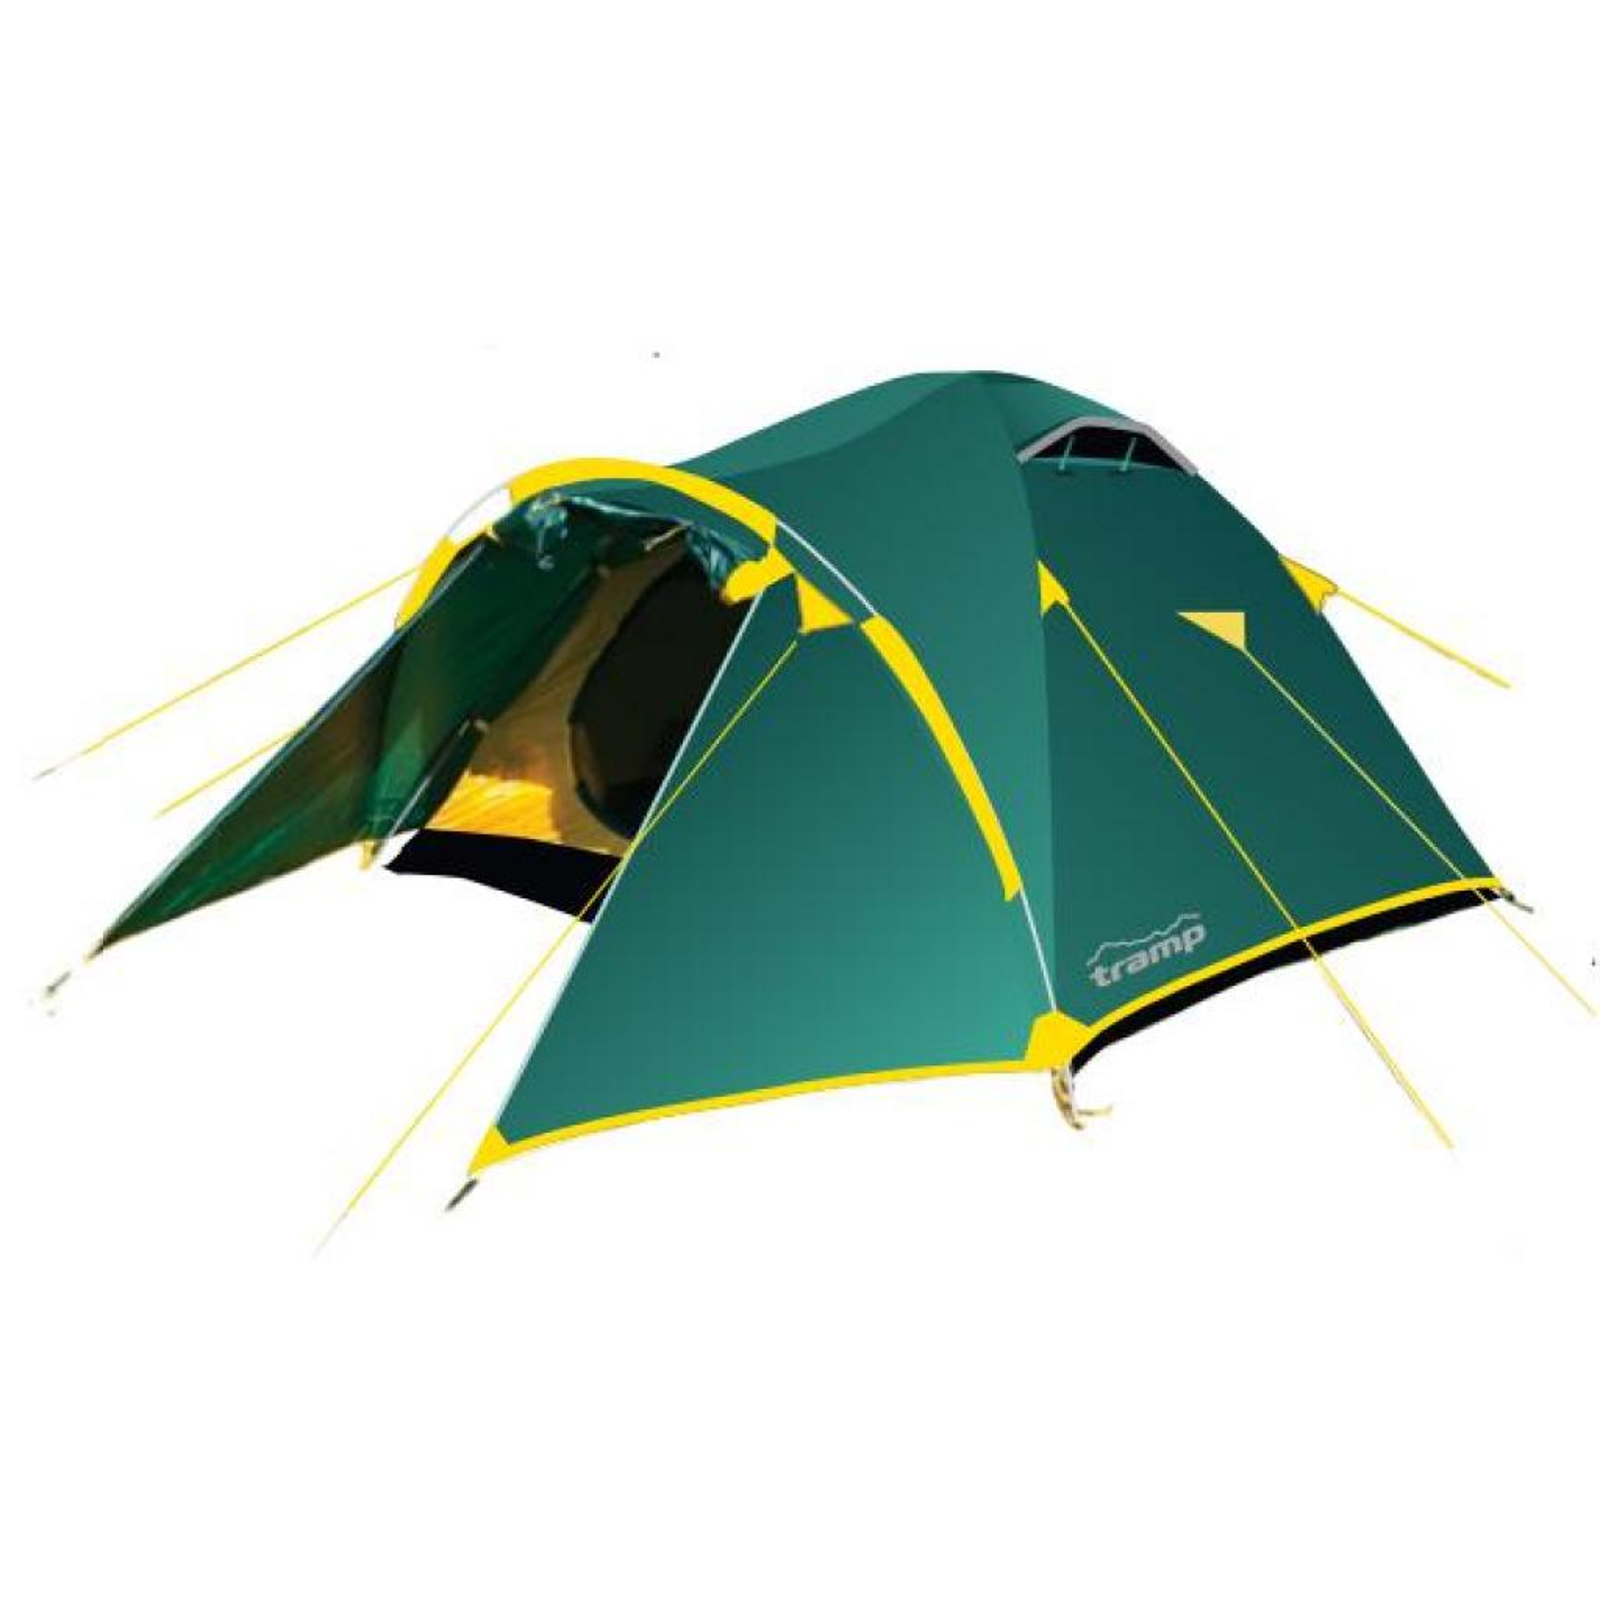 Палатка Tramp Lair 2 v2 (TRT-038)